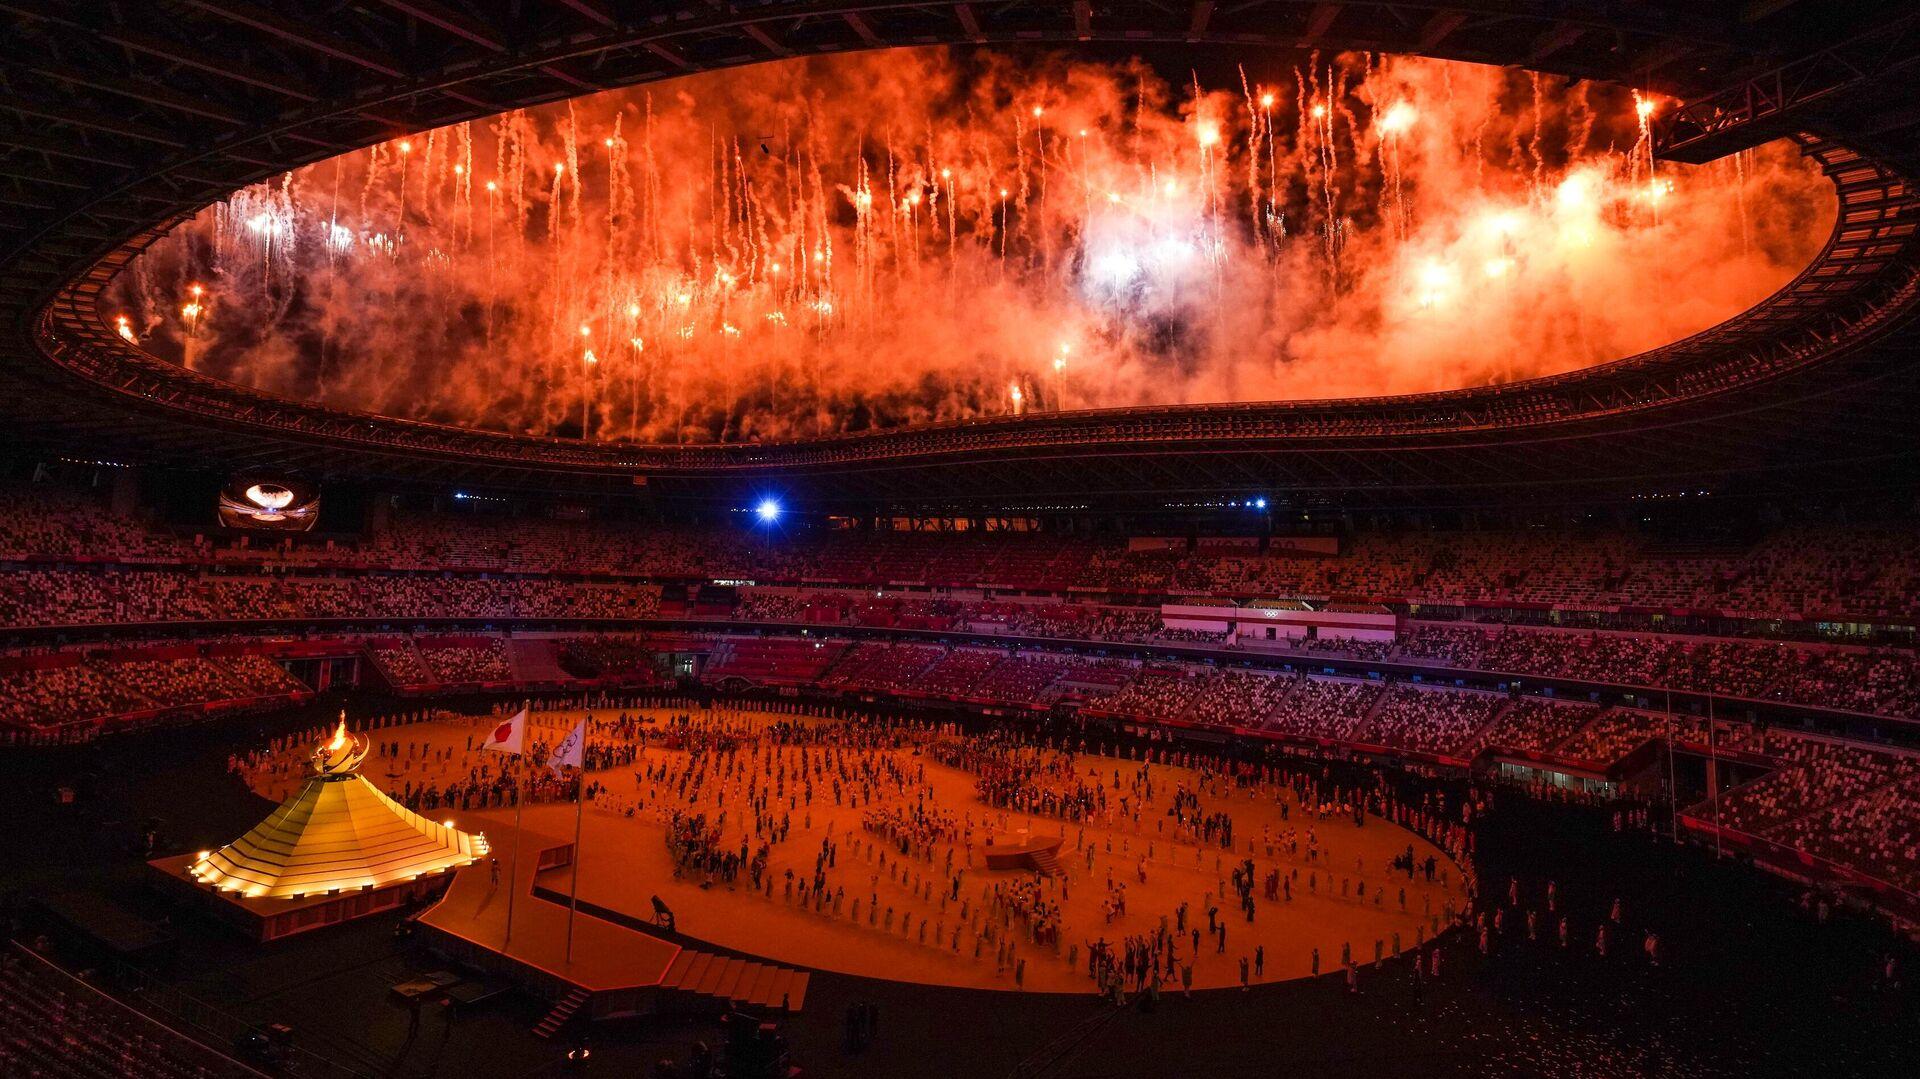 Церемония открытия XXXII летних Олимпийских игр - РИА Новости, 1920, 27.09.2021